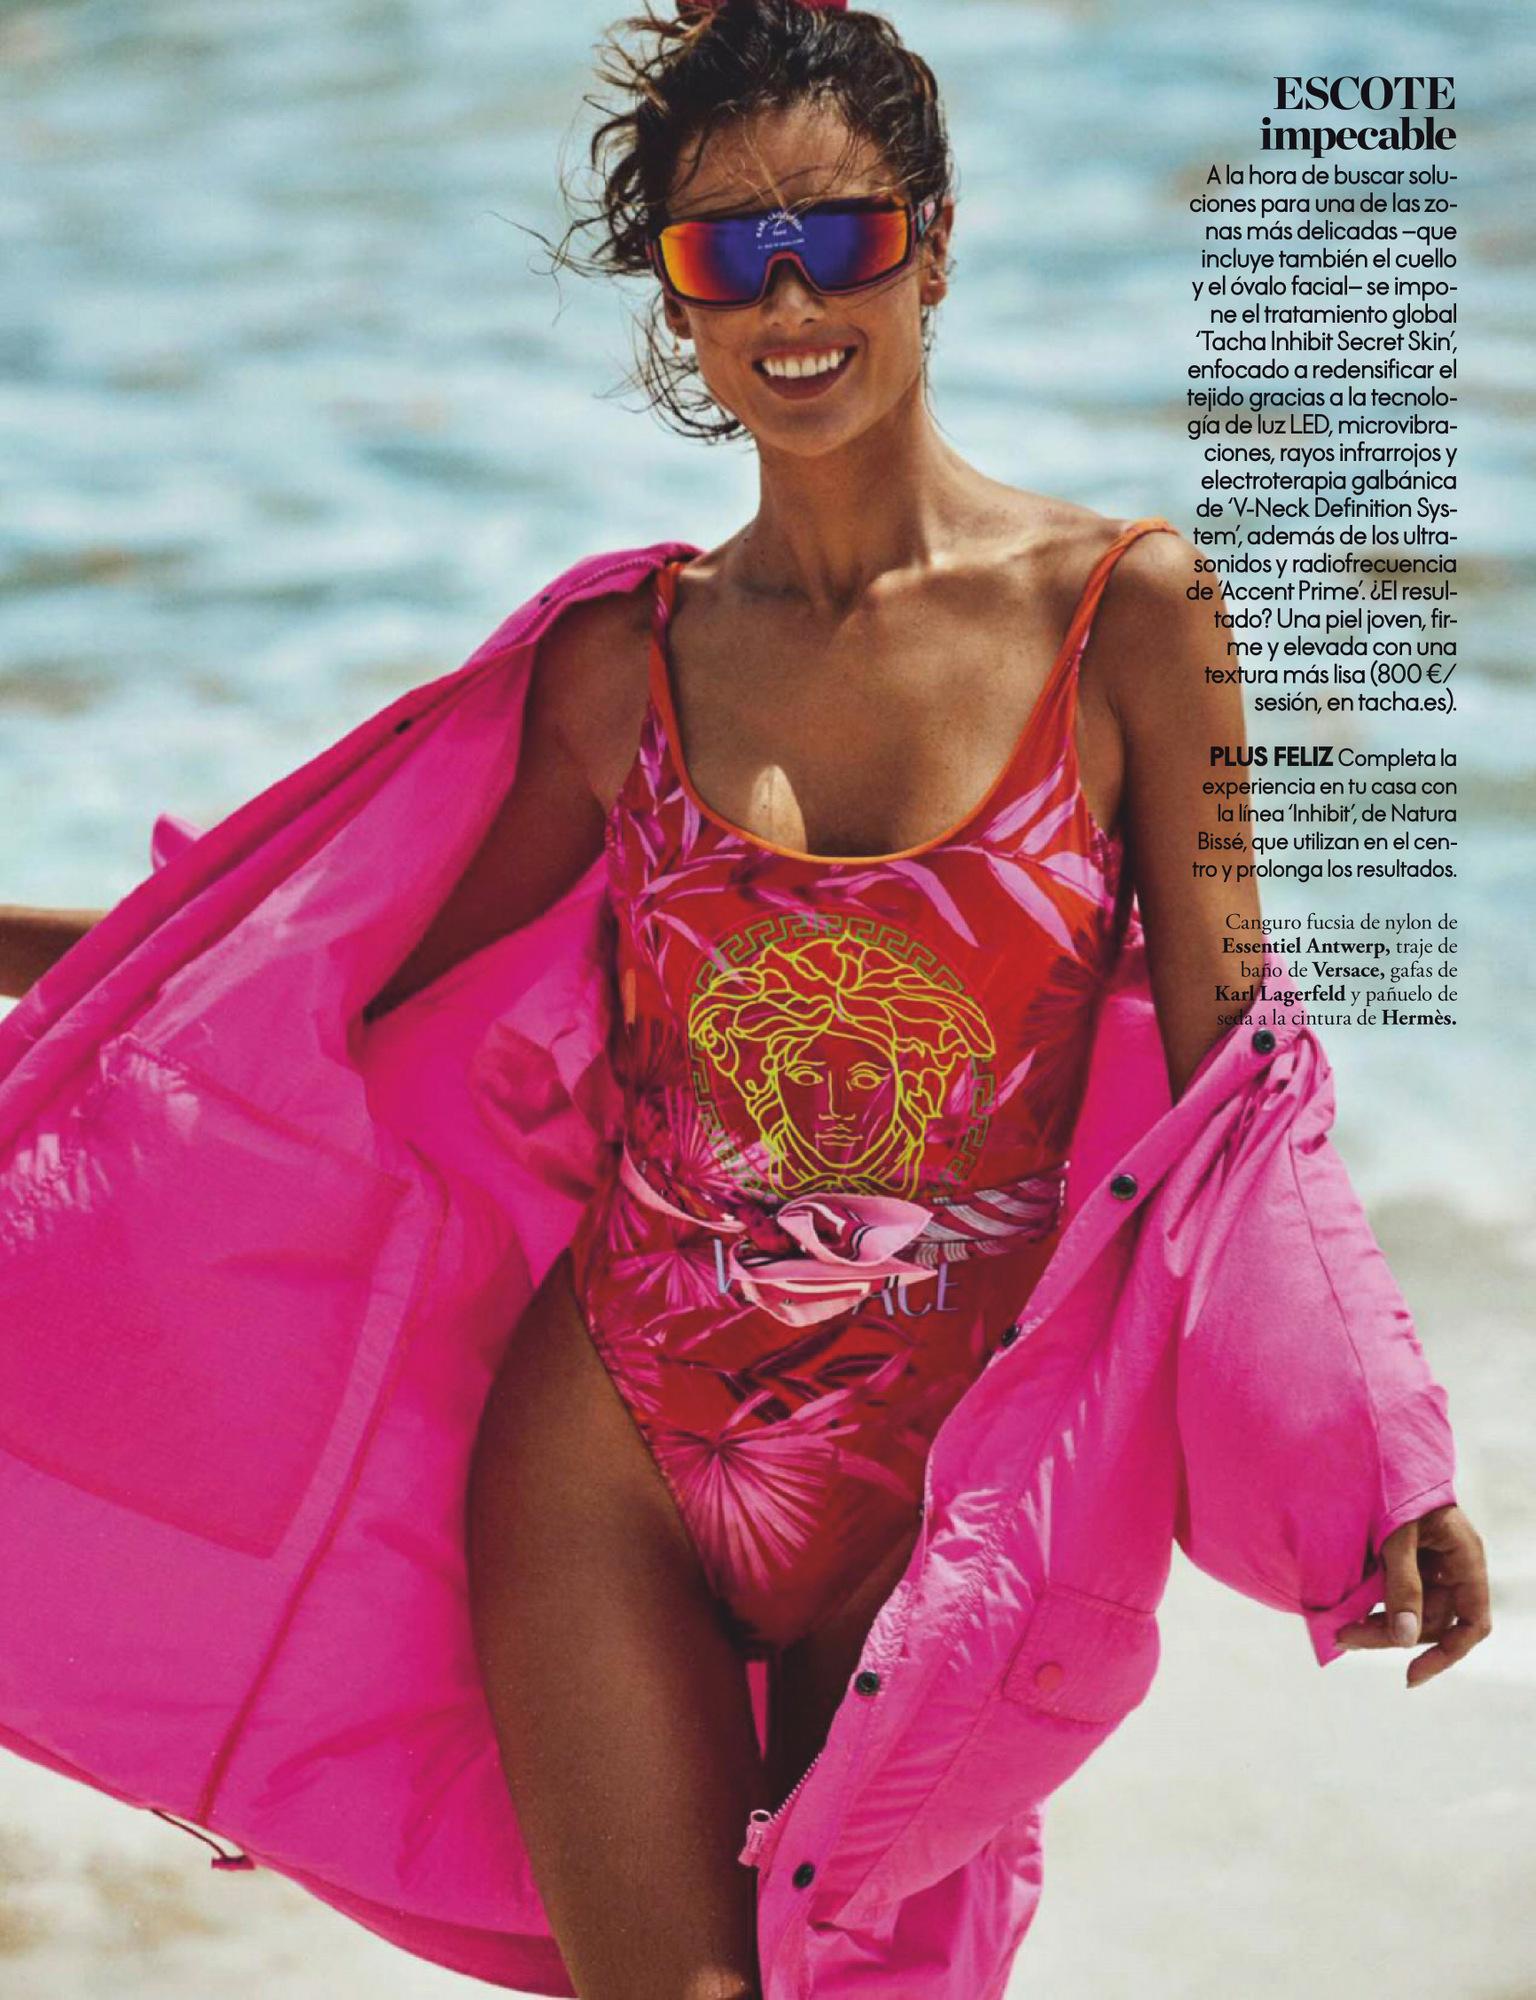 Alessandra Ambrosio – Beautiful Boobs In Sexy Photoshoot For Elle Spain Magazine (june 2020) 0004